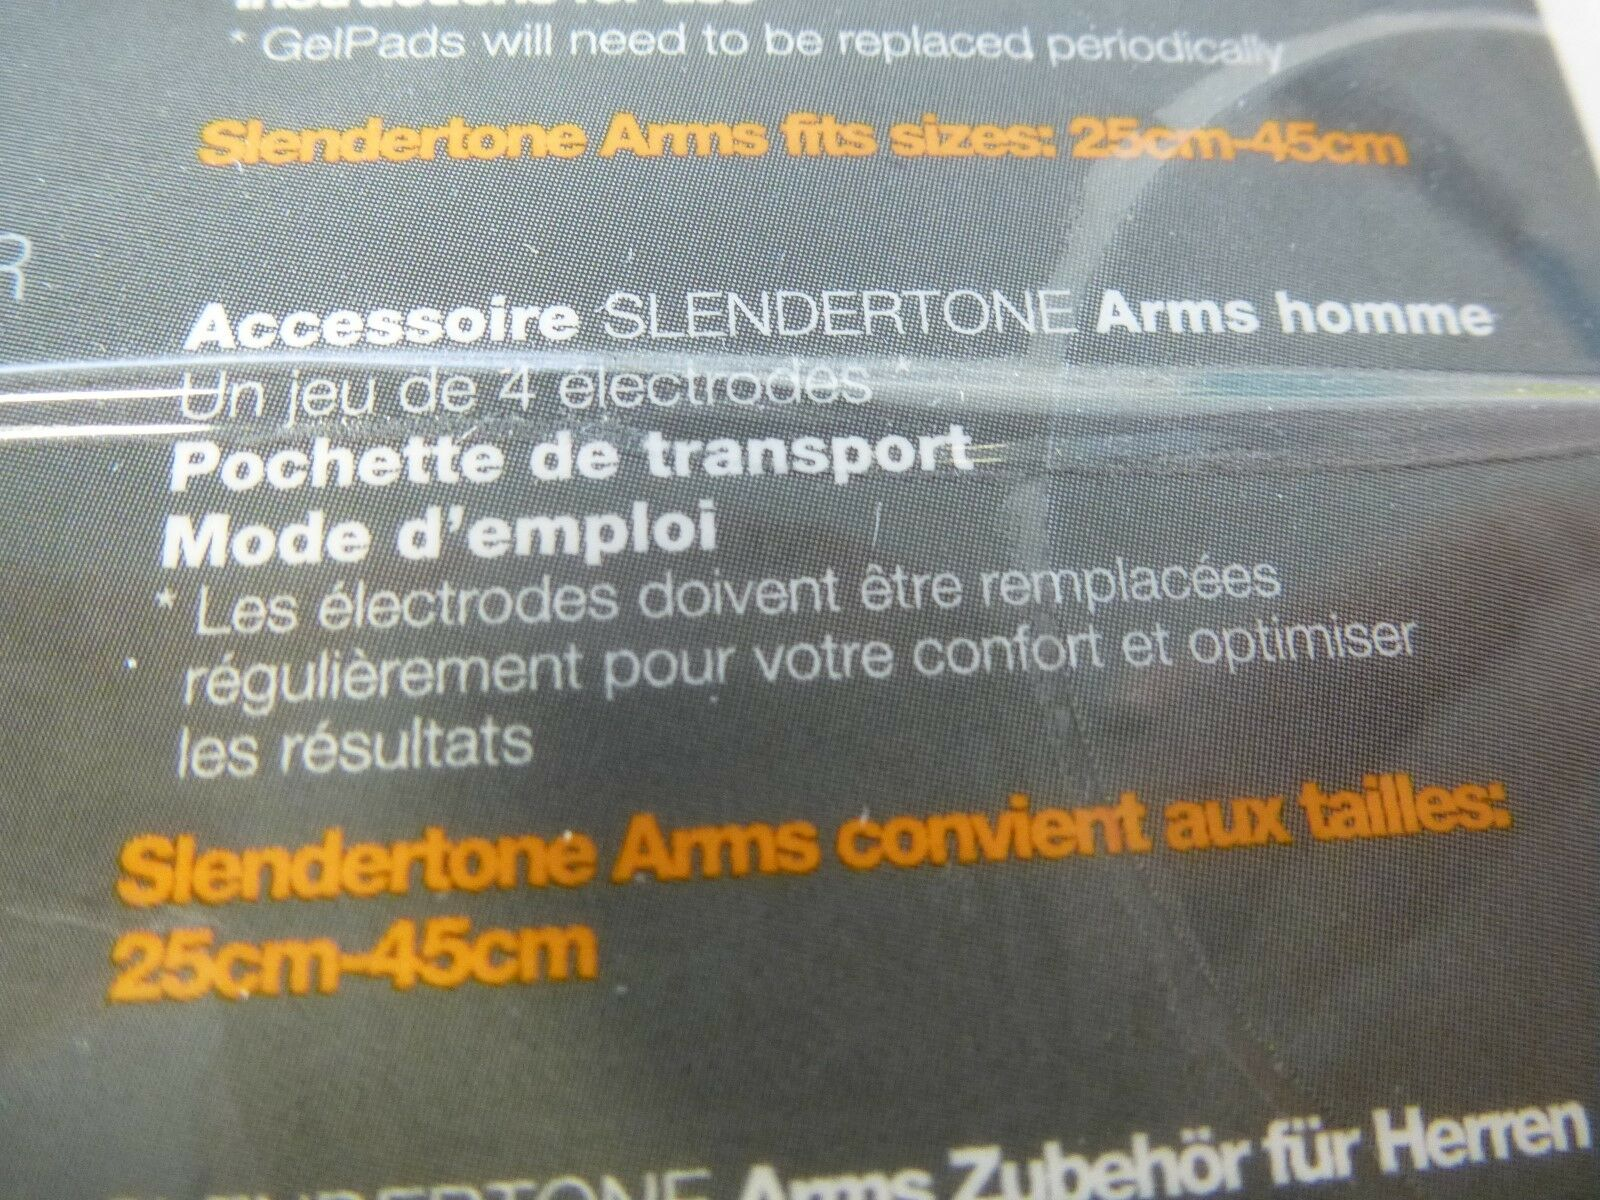 accessoire homme Slendertione arms homme accessoire ( ocacsion ) 78b32a